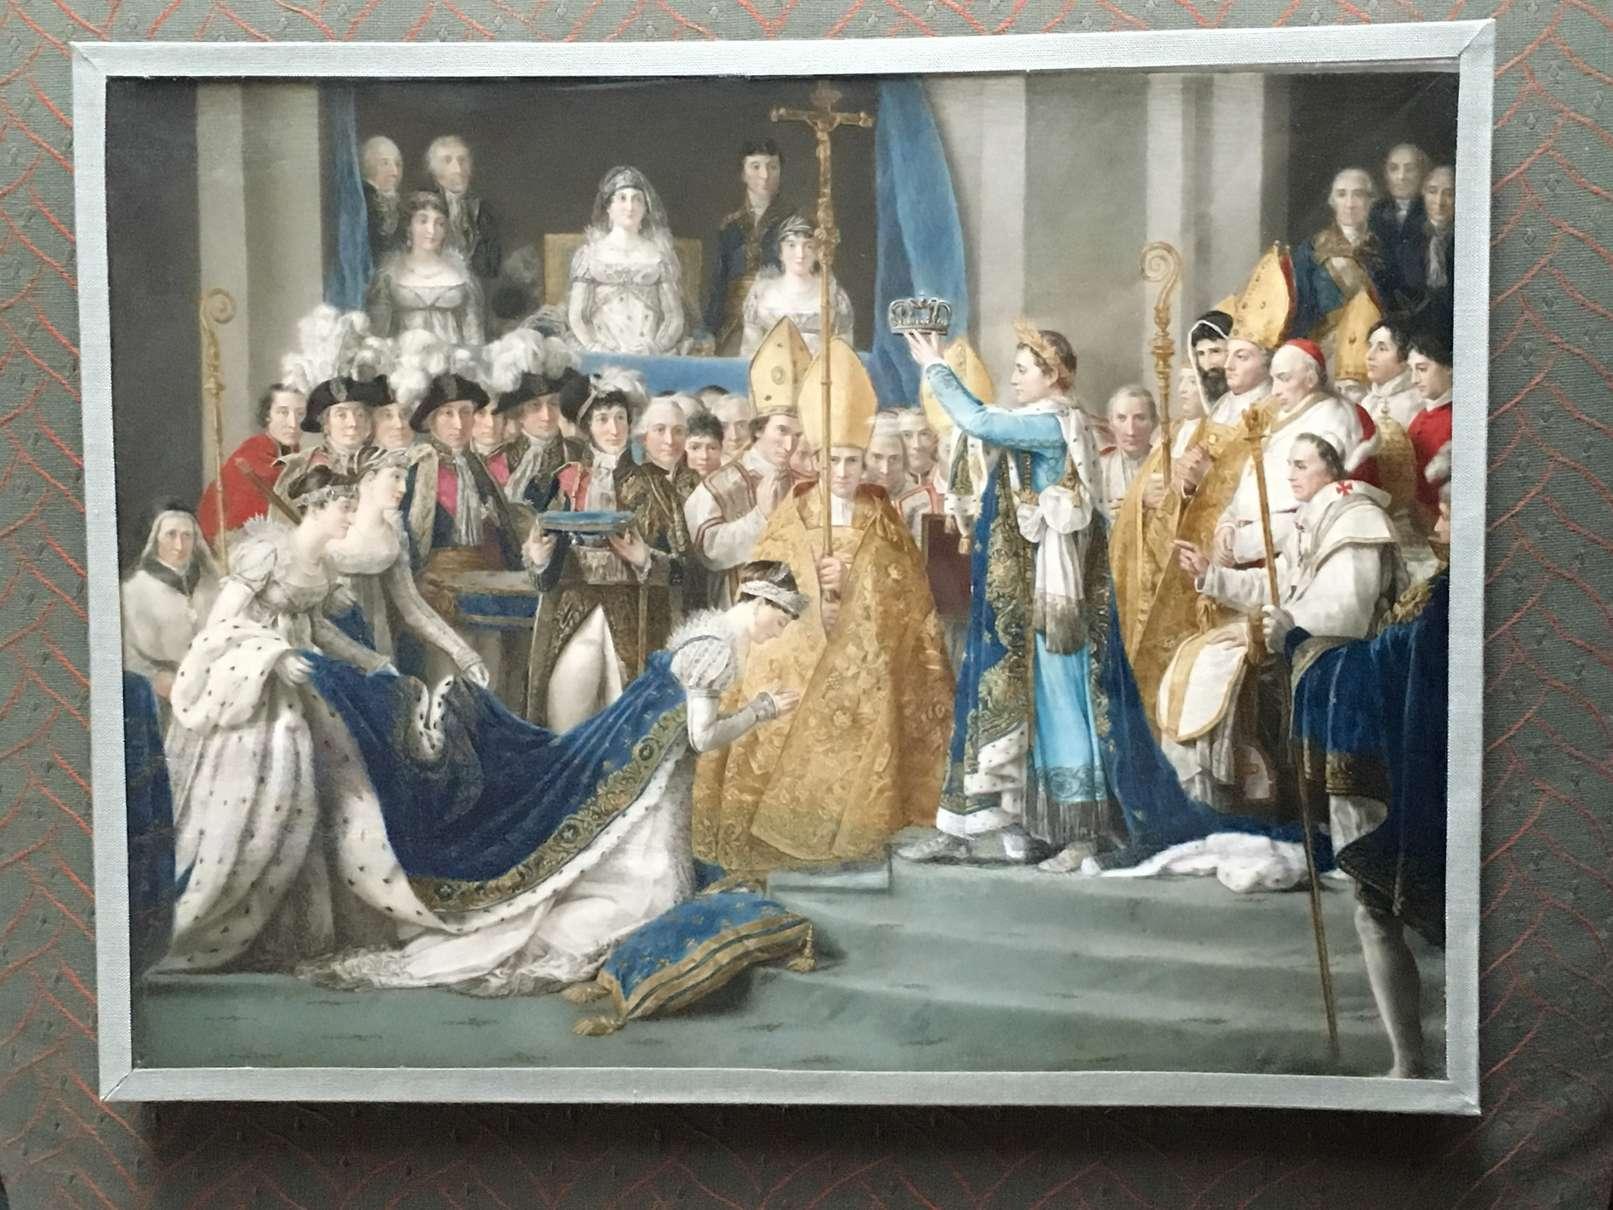 sacre-napoleon-empereur-josephine-david-paris-peinture-ivoire-art-restauration-restaurarte.jpg